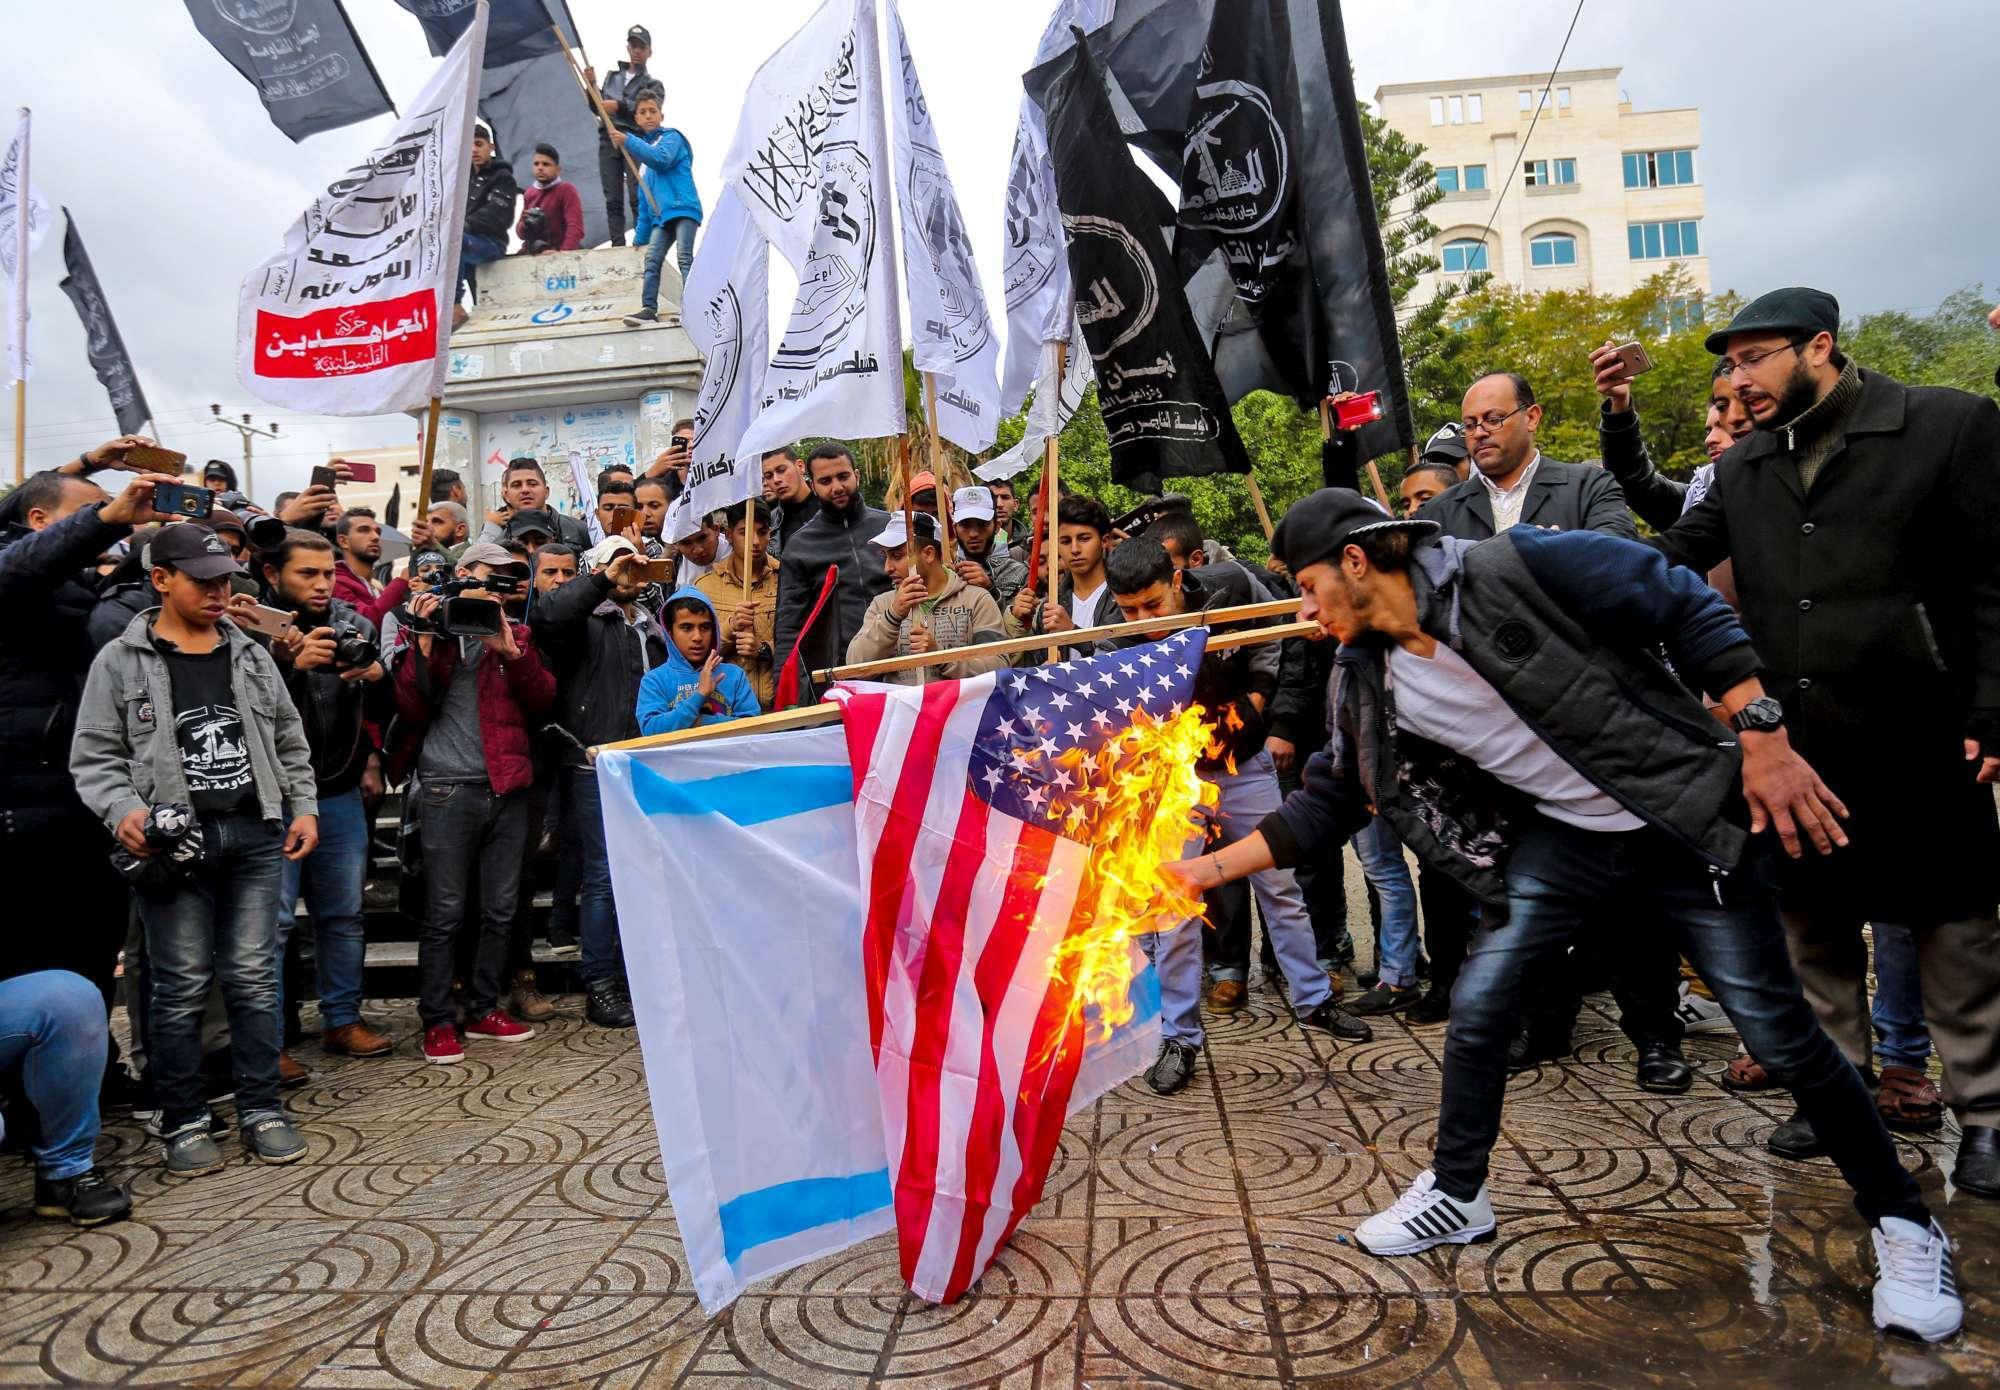 Caso Gerusalemme, proteste a Gaza: bruciate bandiere Usa